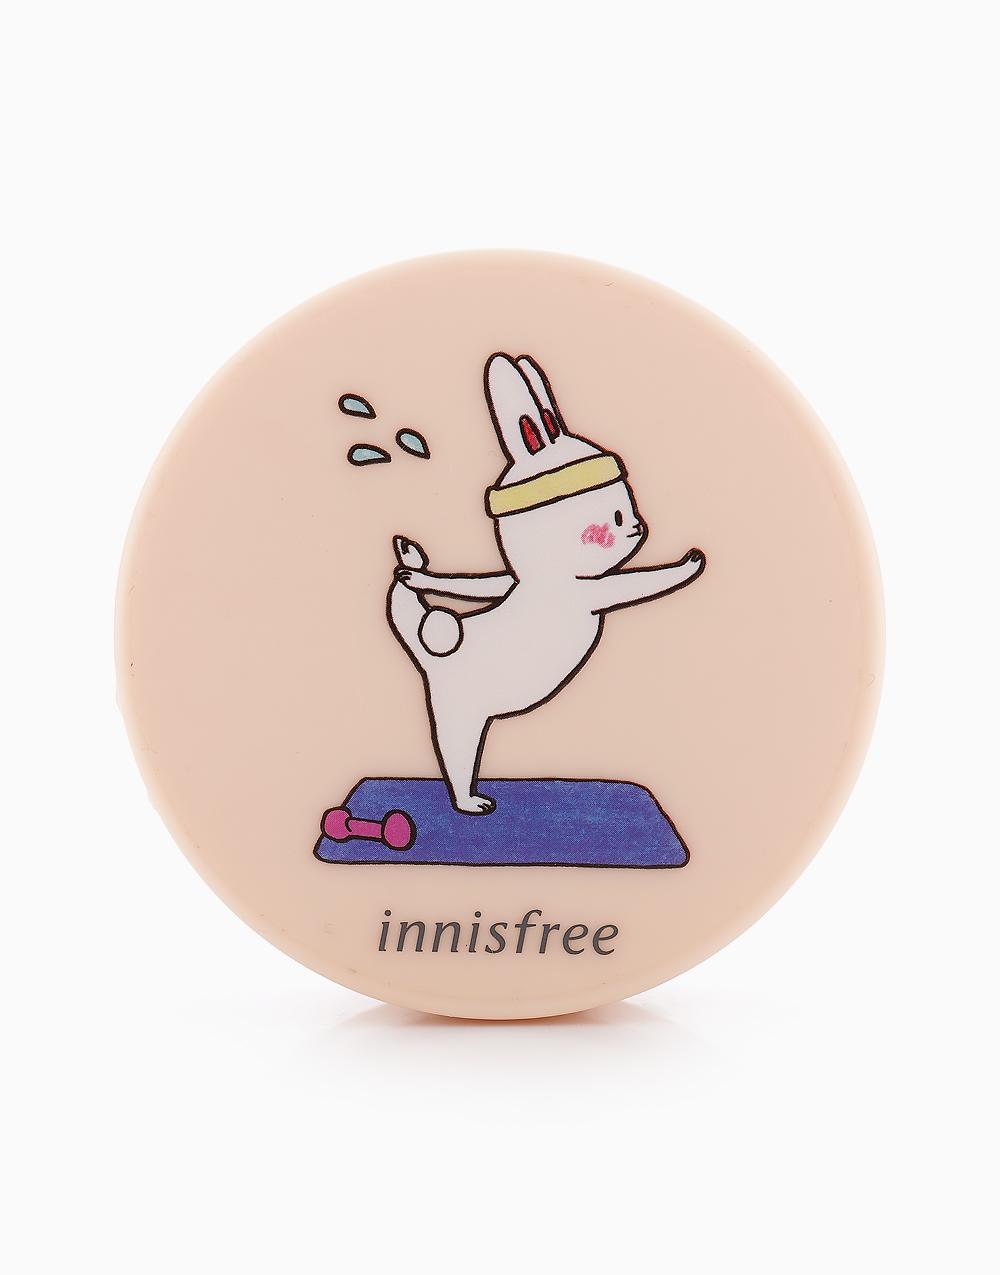 No Sebum Mineral Powder Happy Bunny Edition (5g) by Innisfree | #8 Upward Facing Bunny